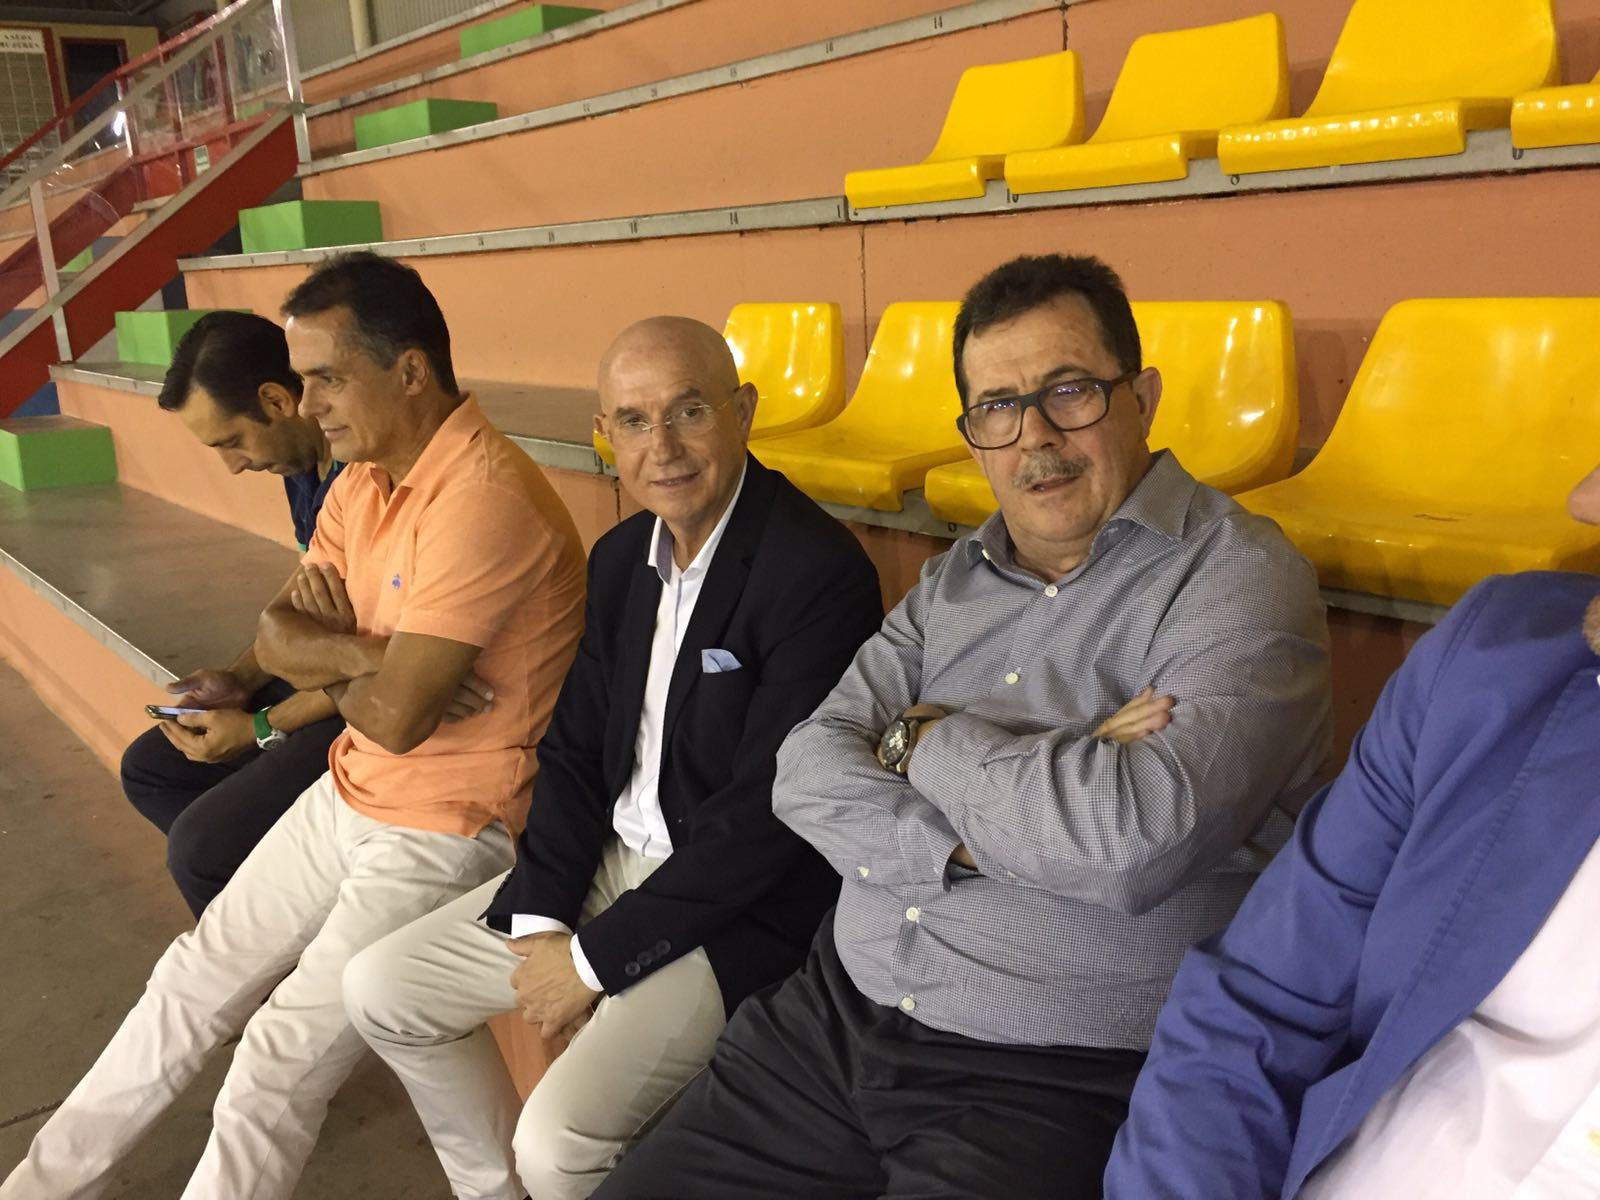 Serra Ferrer estuvo en el palco del Betis - Palma Futsal 2